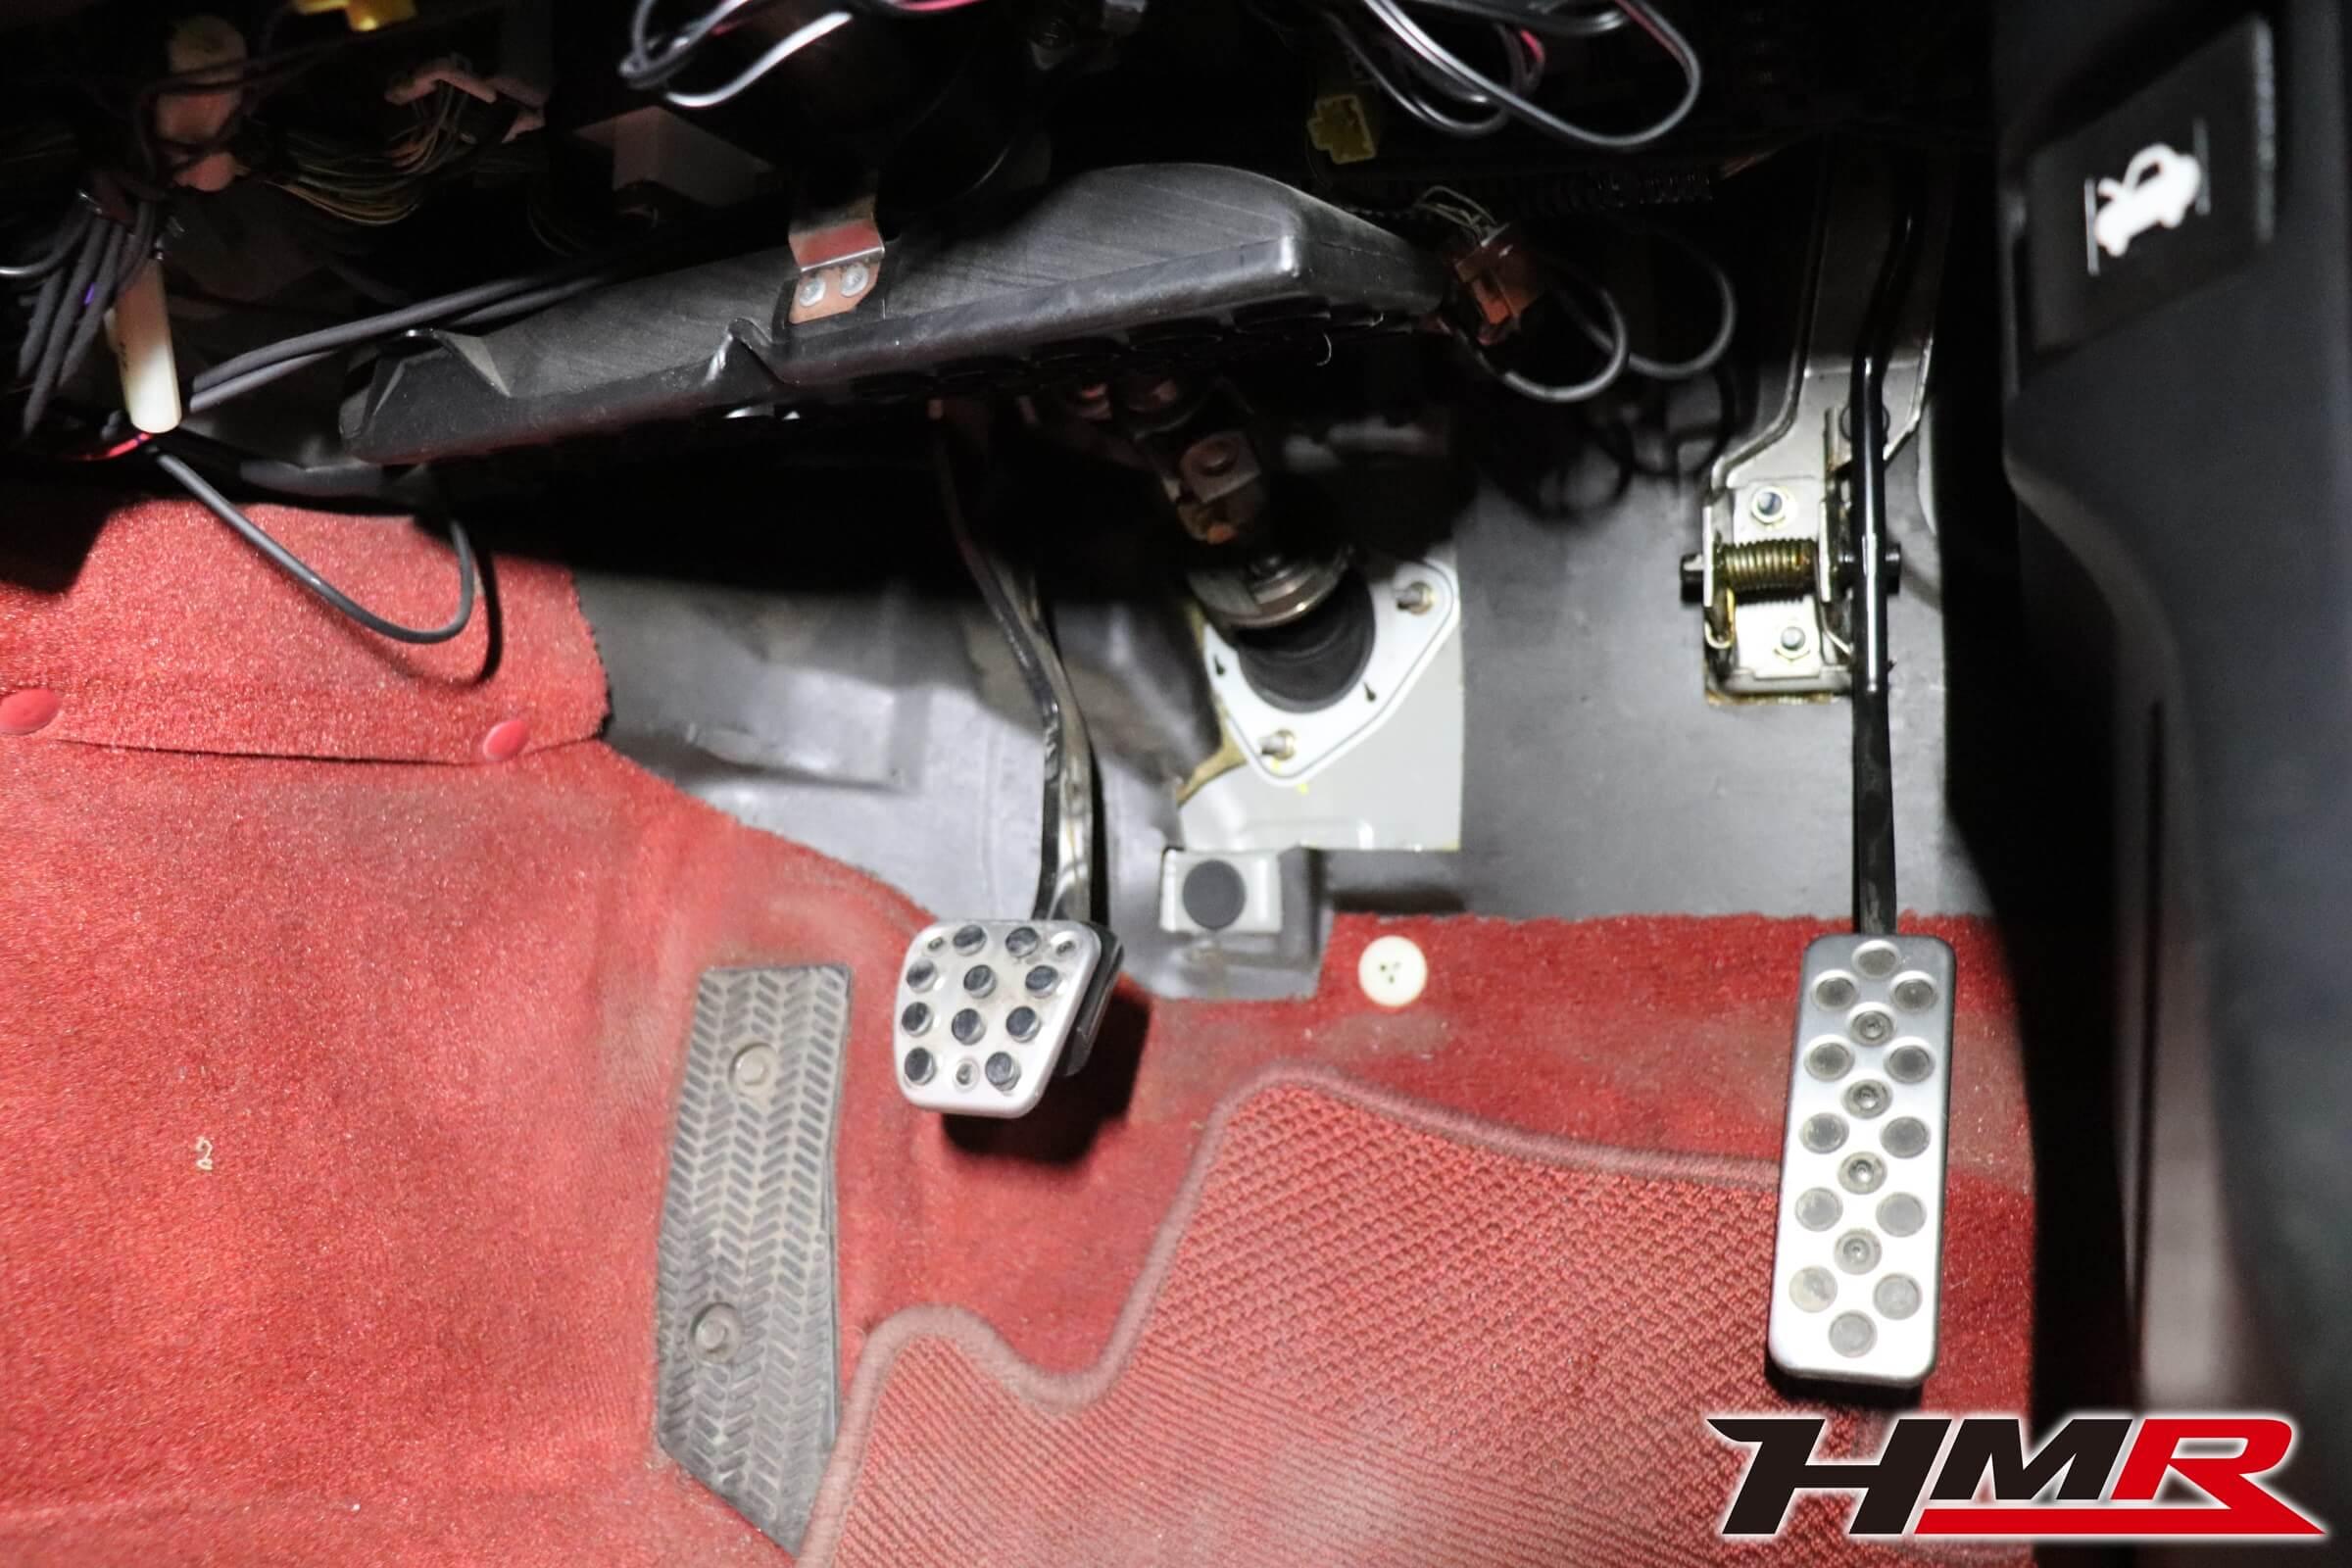 HMR S2000 ASM強化ブレーキペダル交換